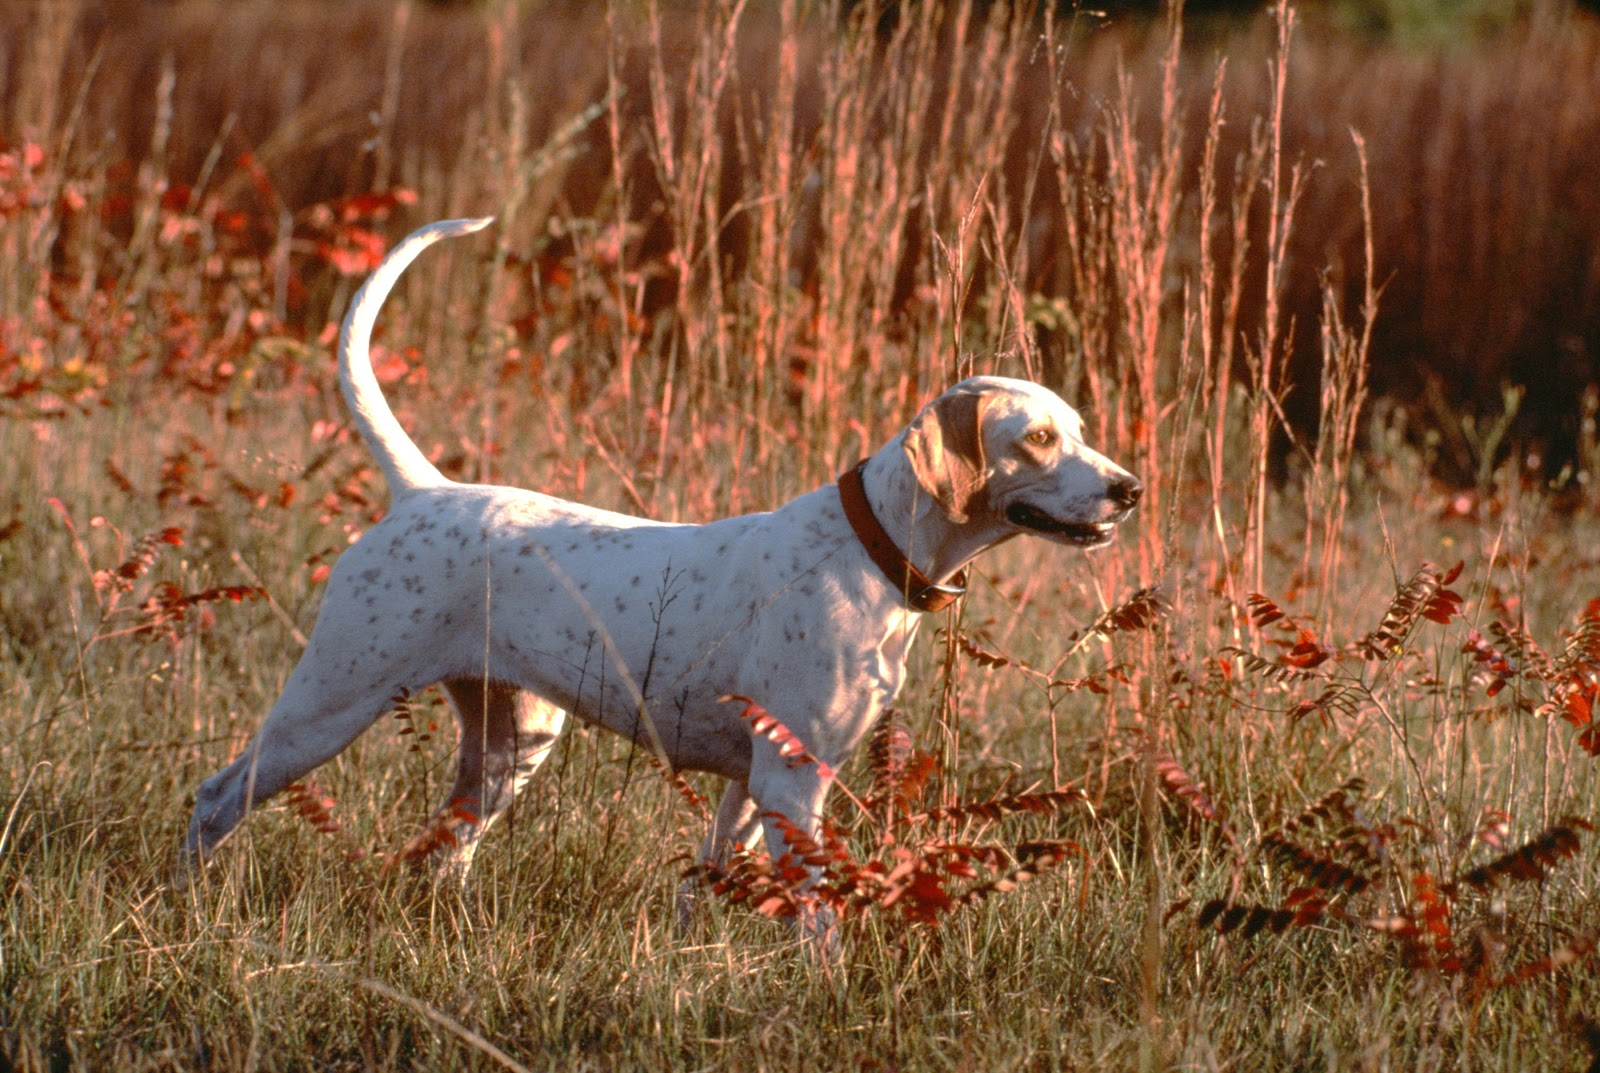 fss insider hunting dogs safety